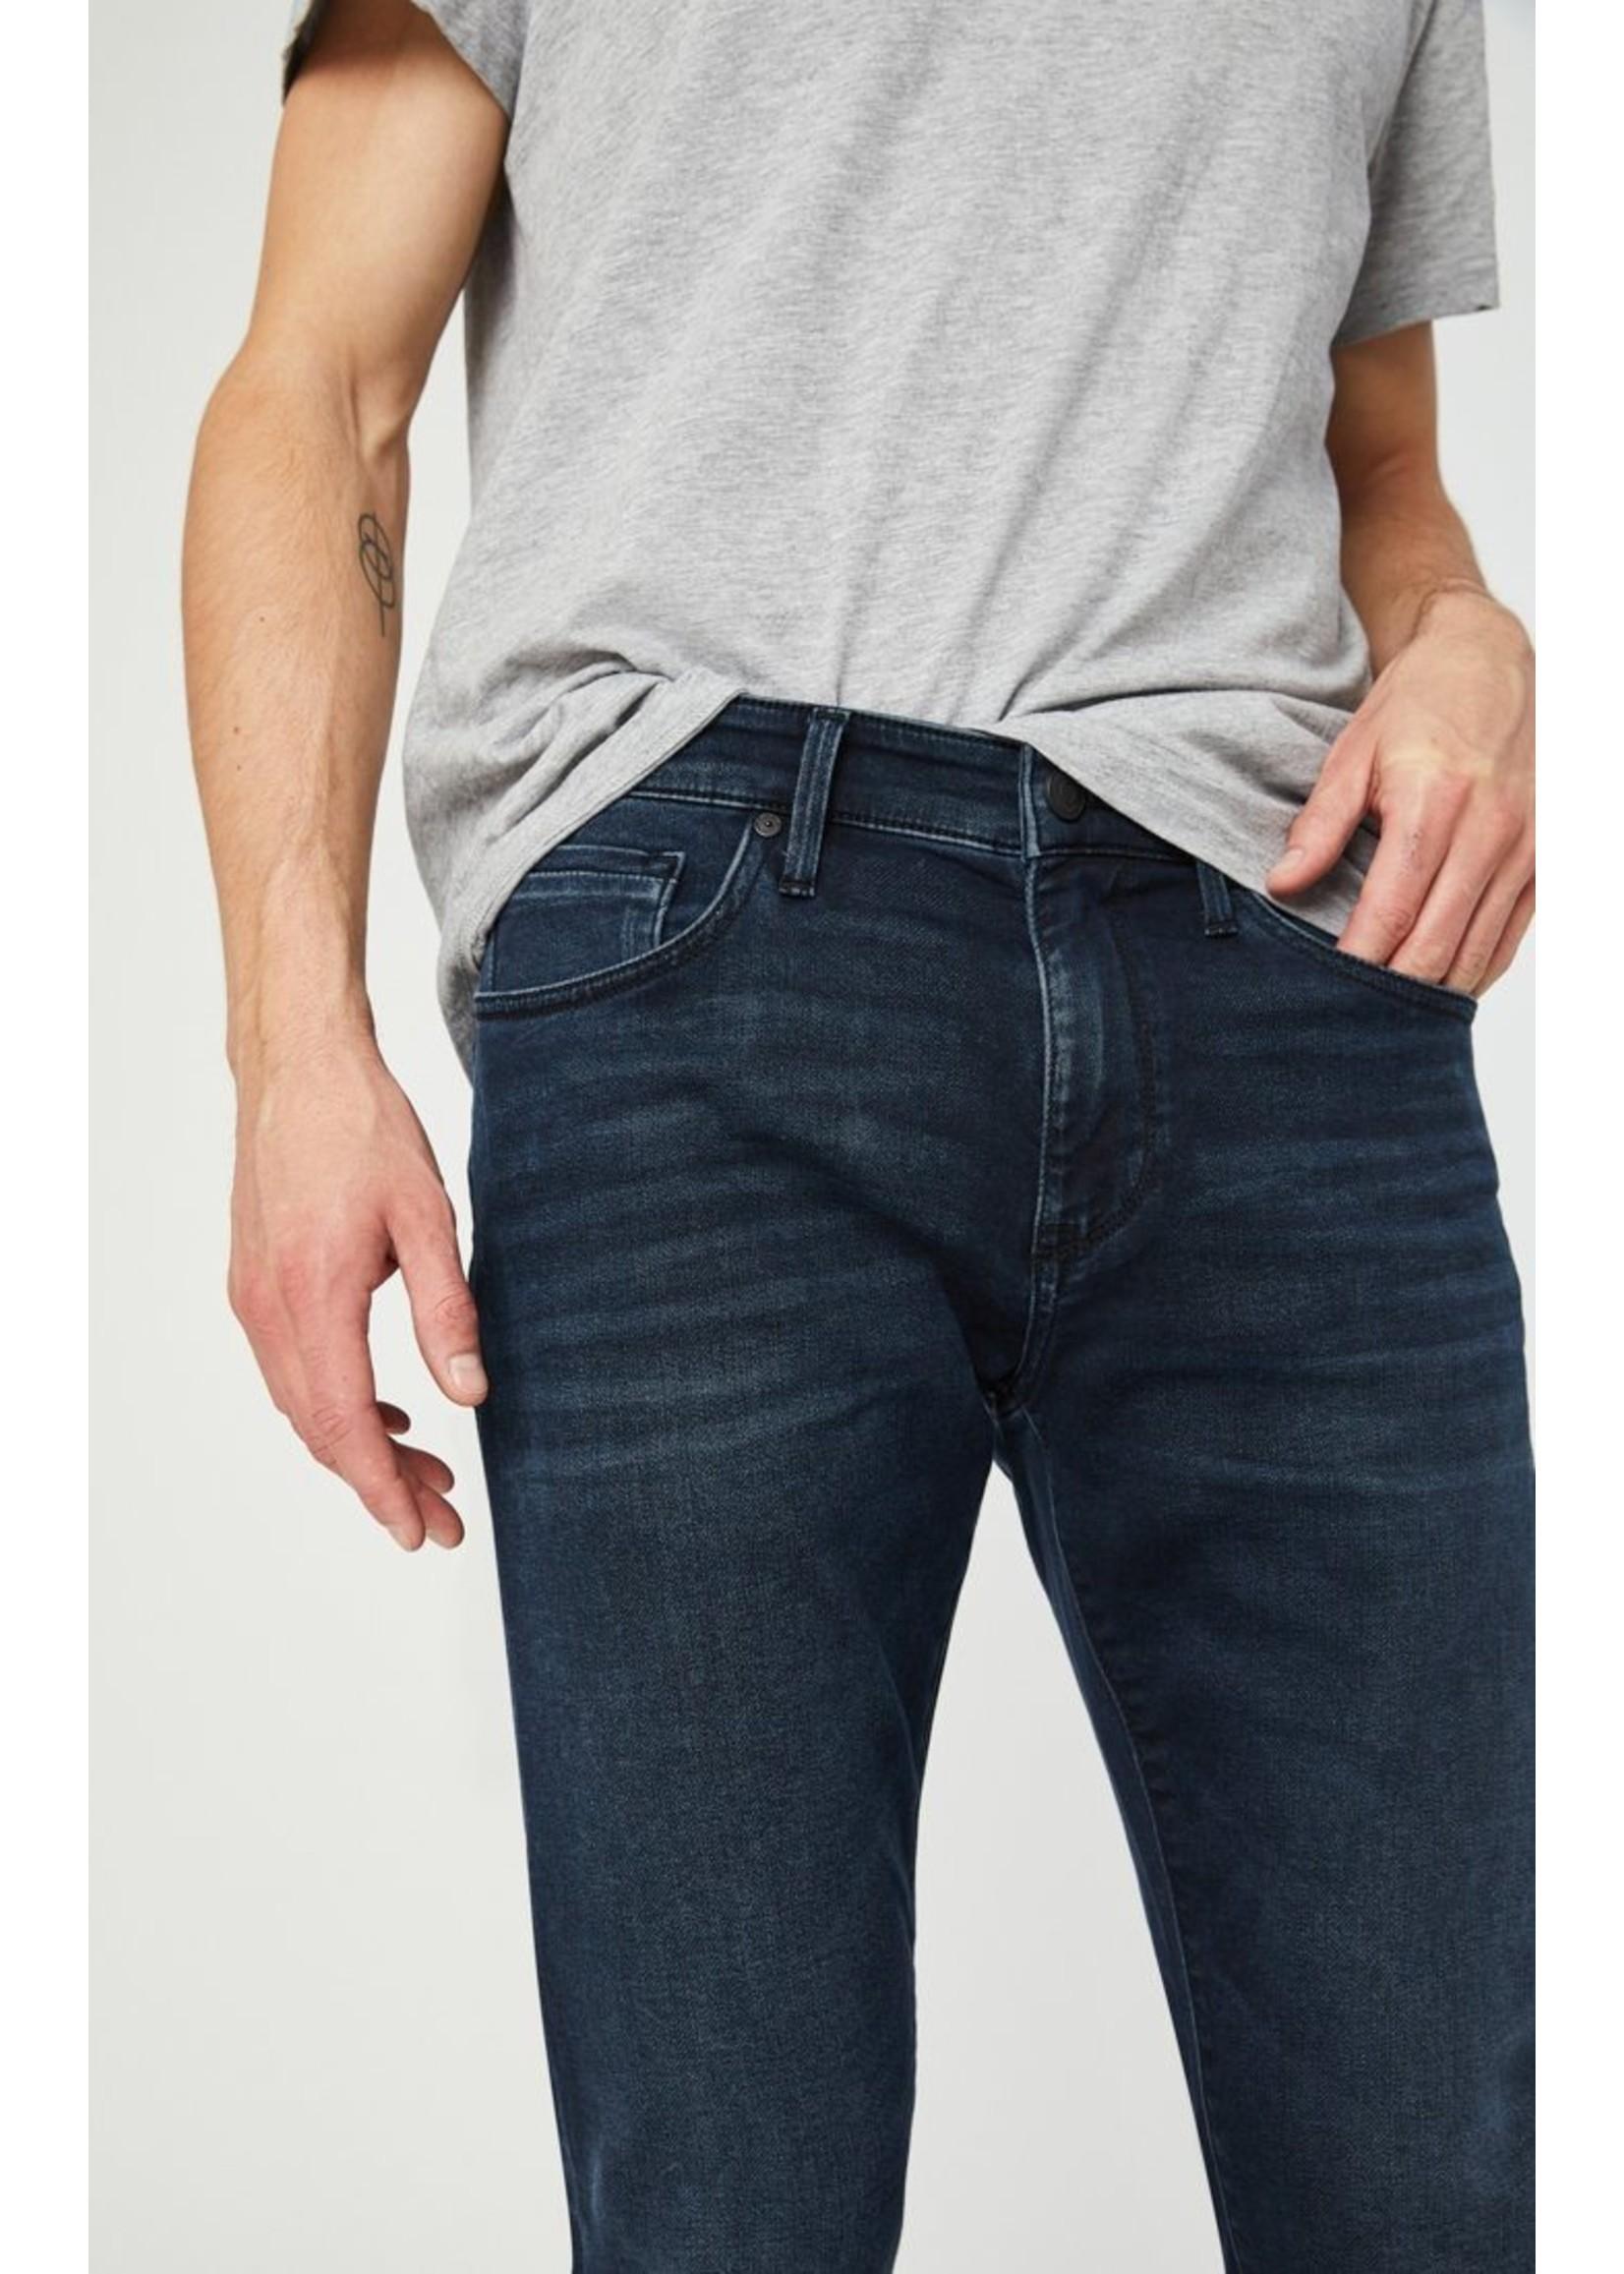 Mavi Jeans Jake Blue Black Athletic